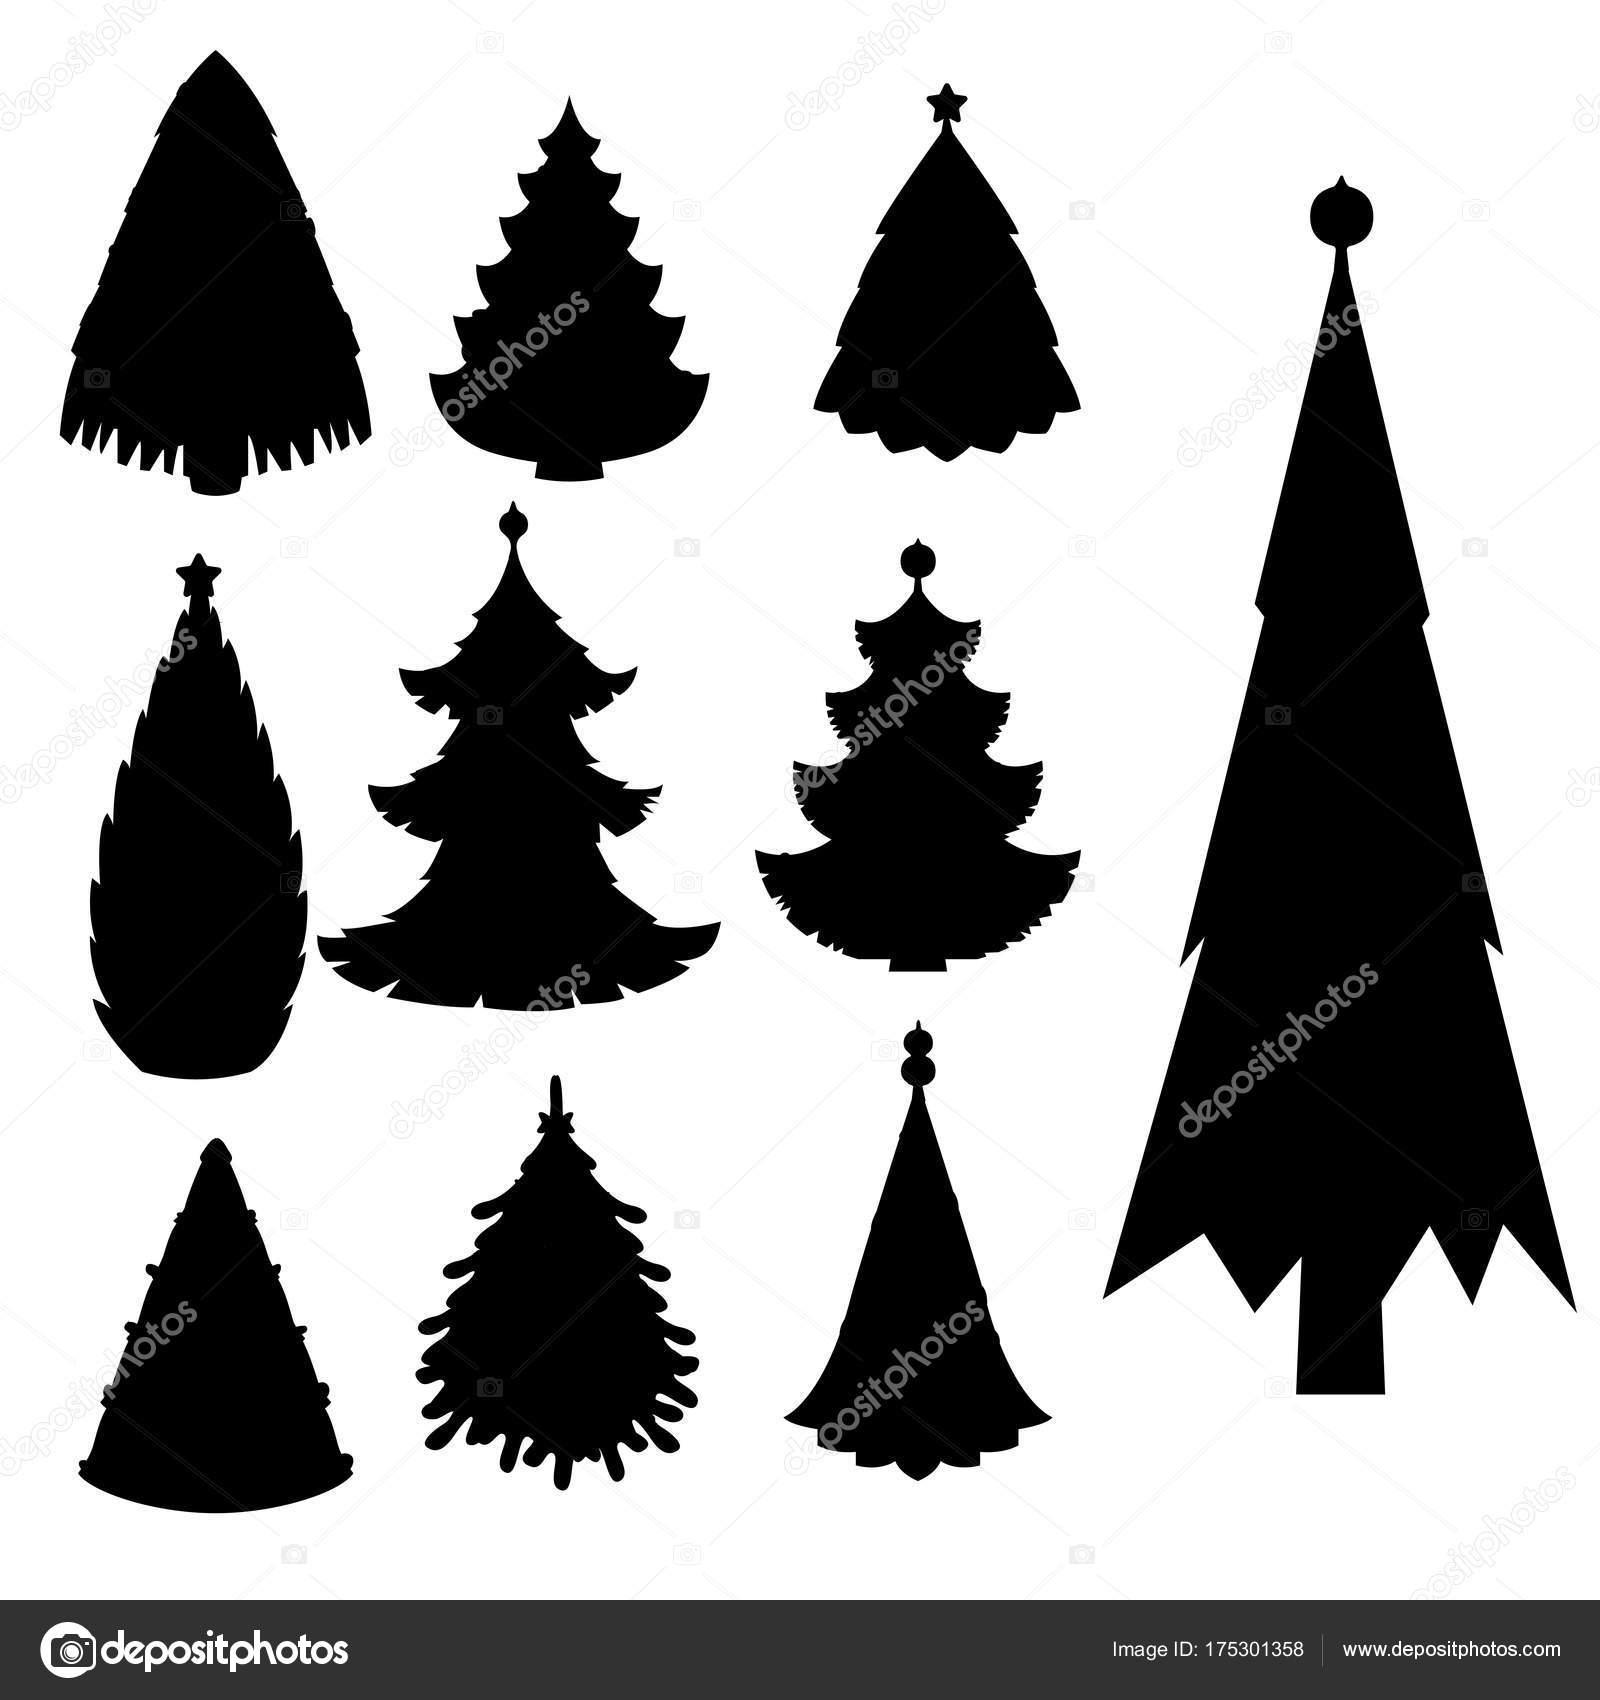 Christmas Tree Vector Black Silhouette Star Xmas Gift Design Holiday